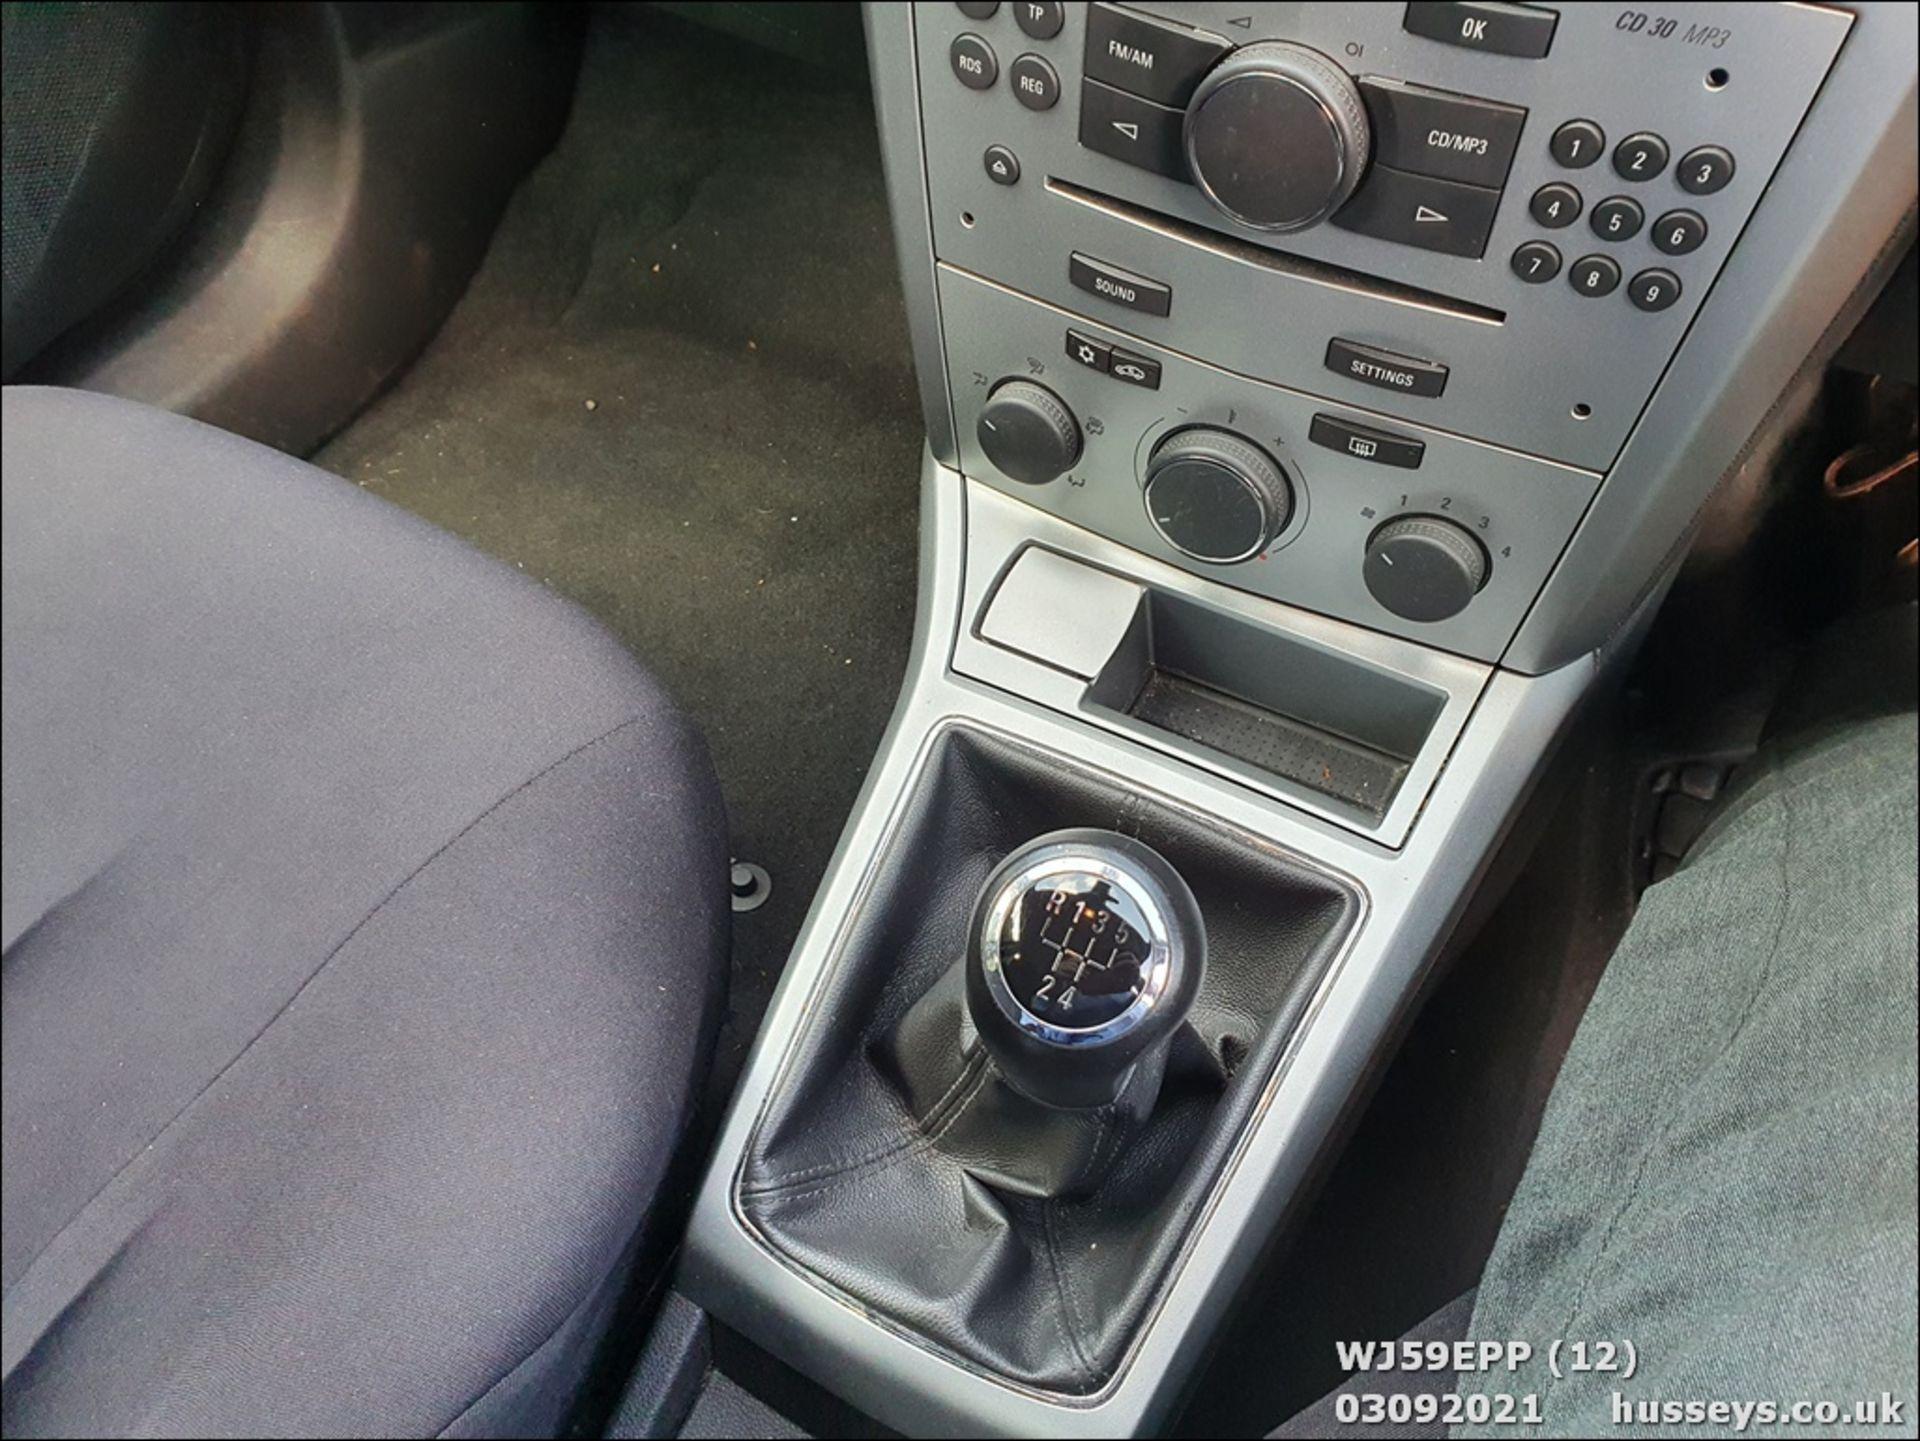 09/59 VAUXHALL ASTRA ACTIVE - 1364cc 5dr Hatchback (Silver, 101k) - Image 12 of 12